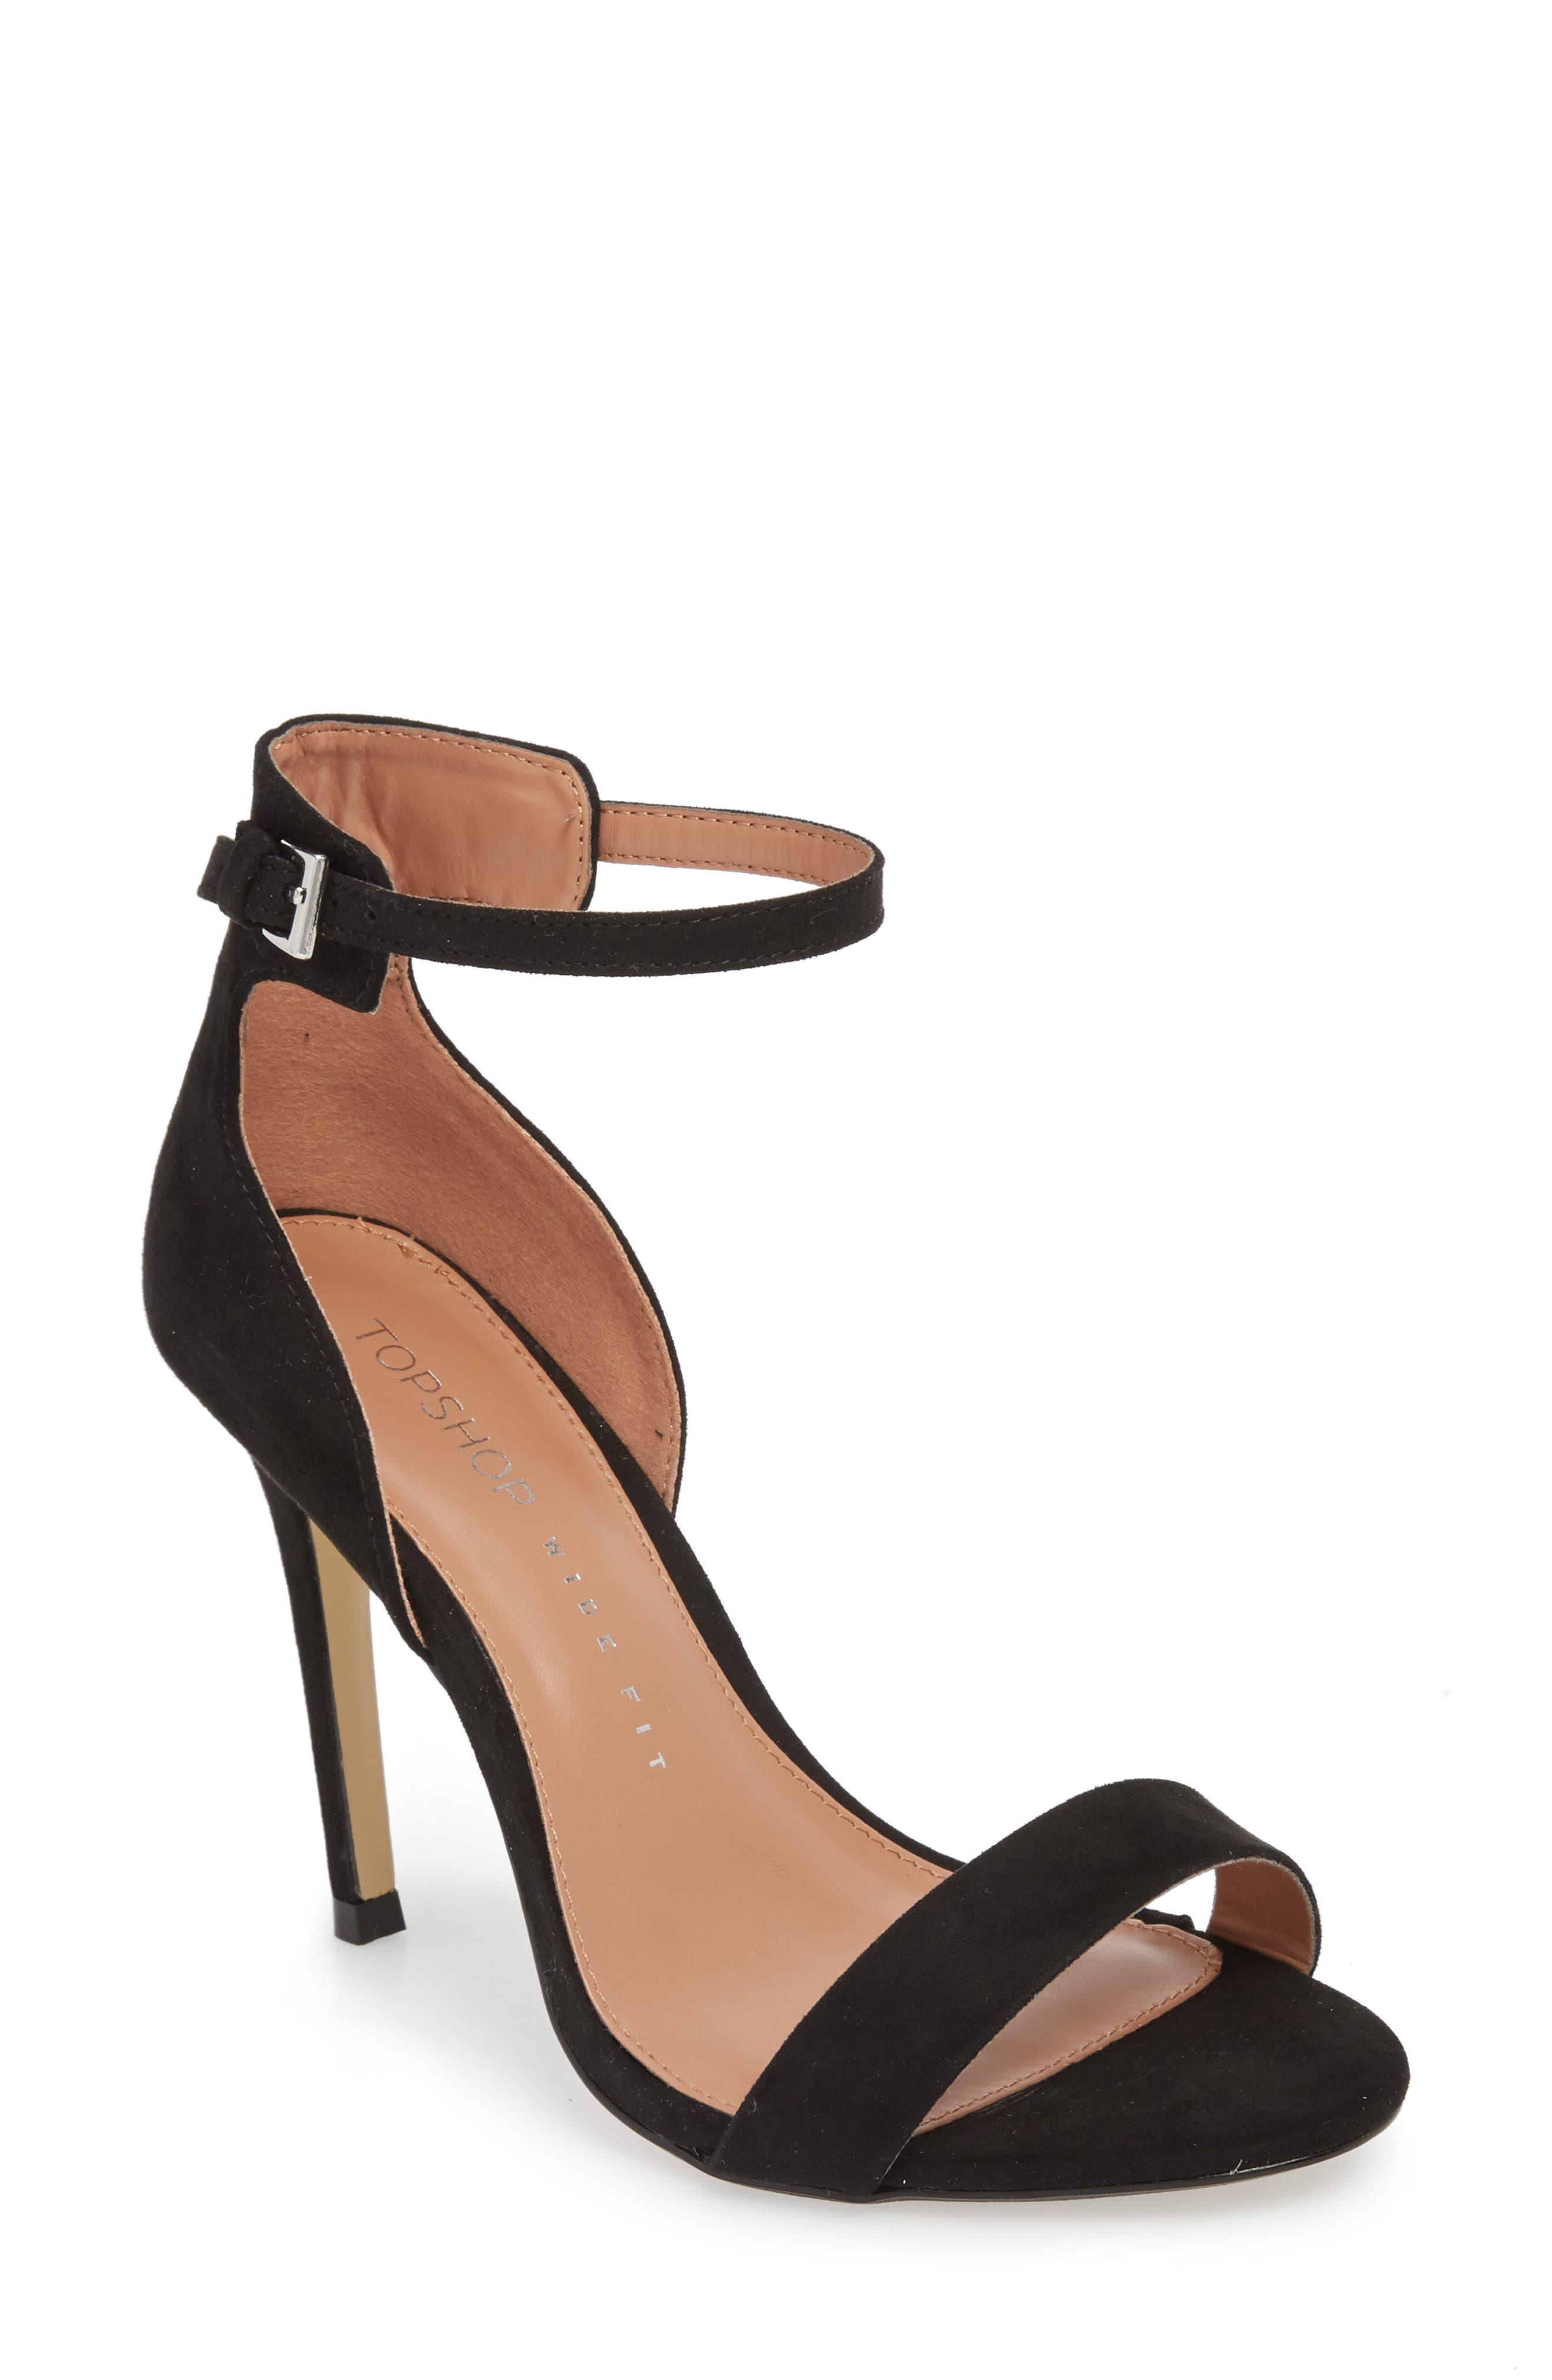 Marcelle Ankle Strap Sandal,                         Main,                         color, Black